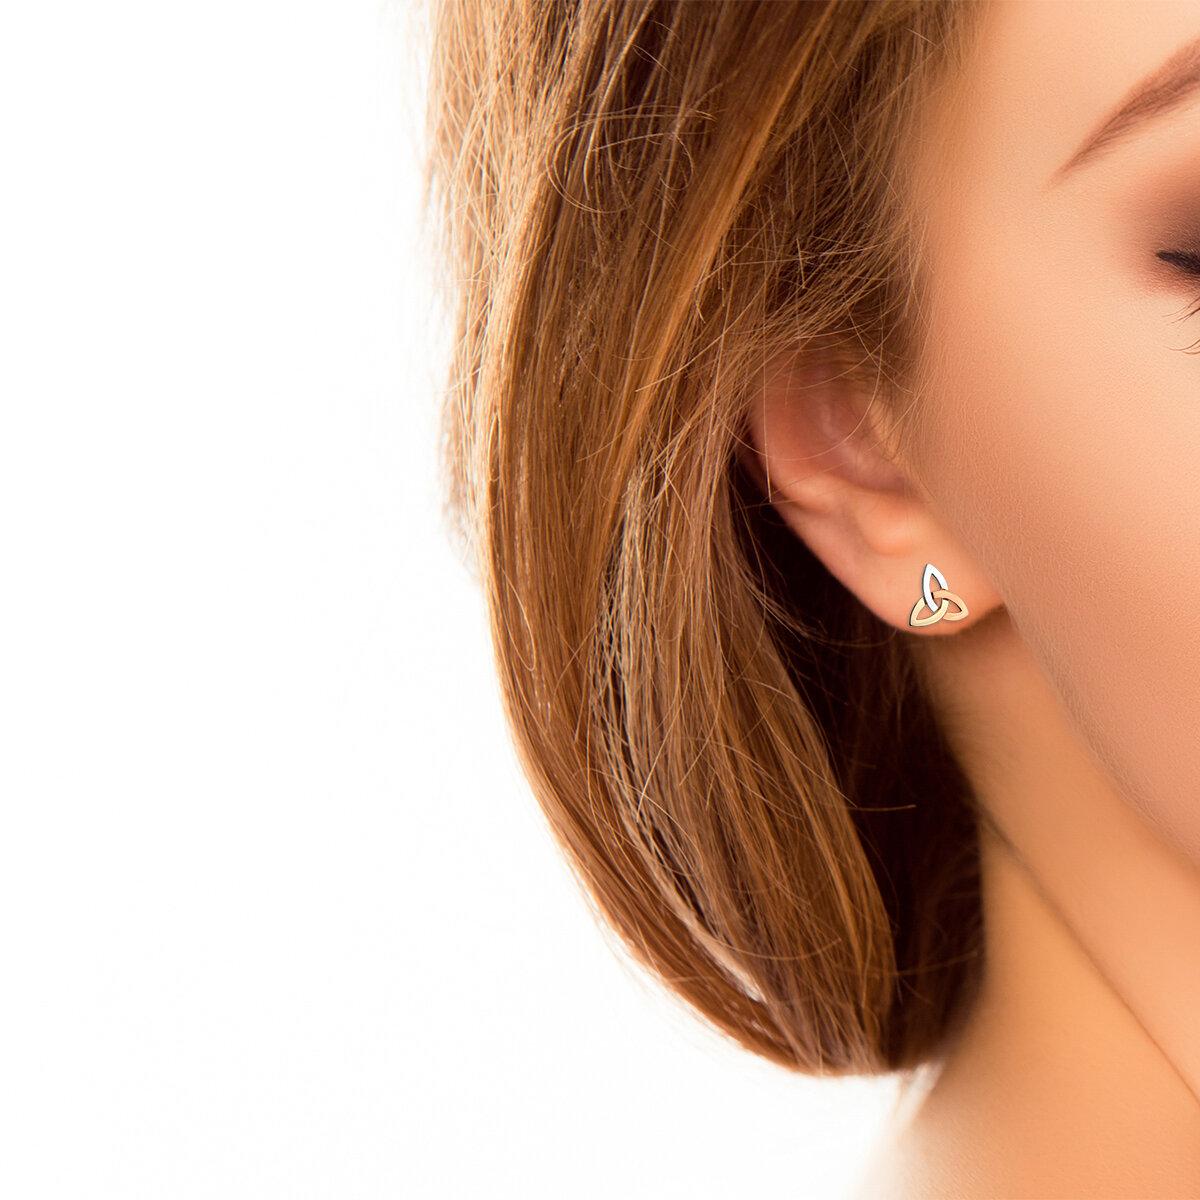 14 karat  multi gold colour trinity knot stud earrings S33136 presented on a model